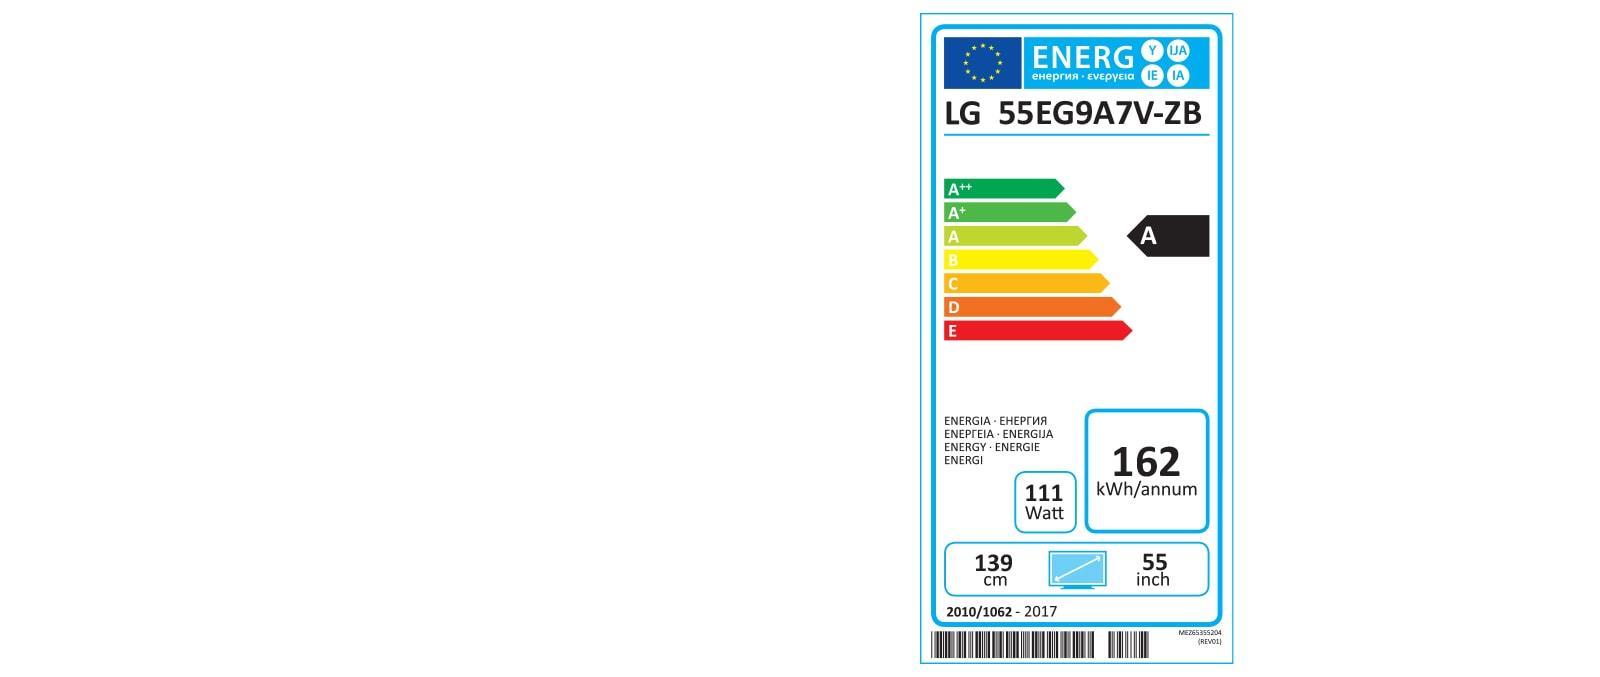 Etiquette-Energie_DES_V1